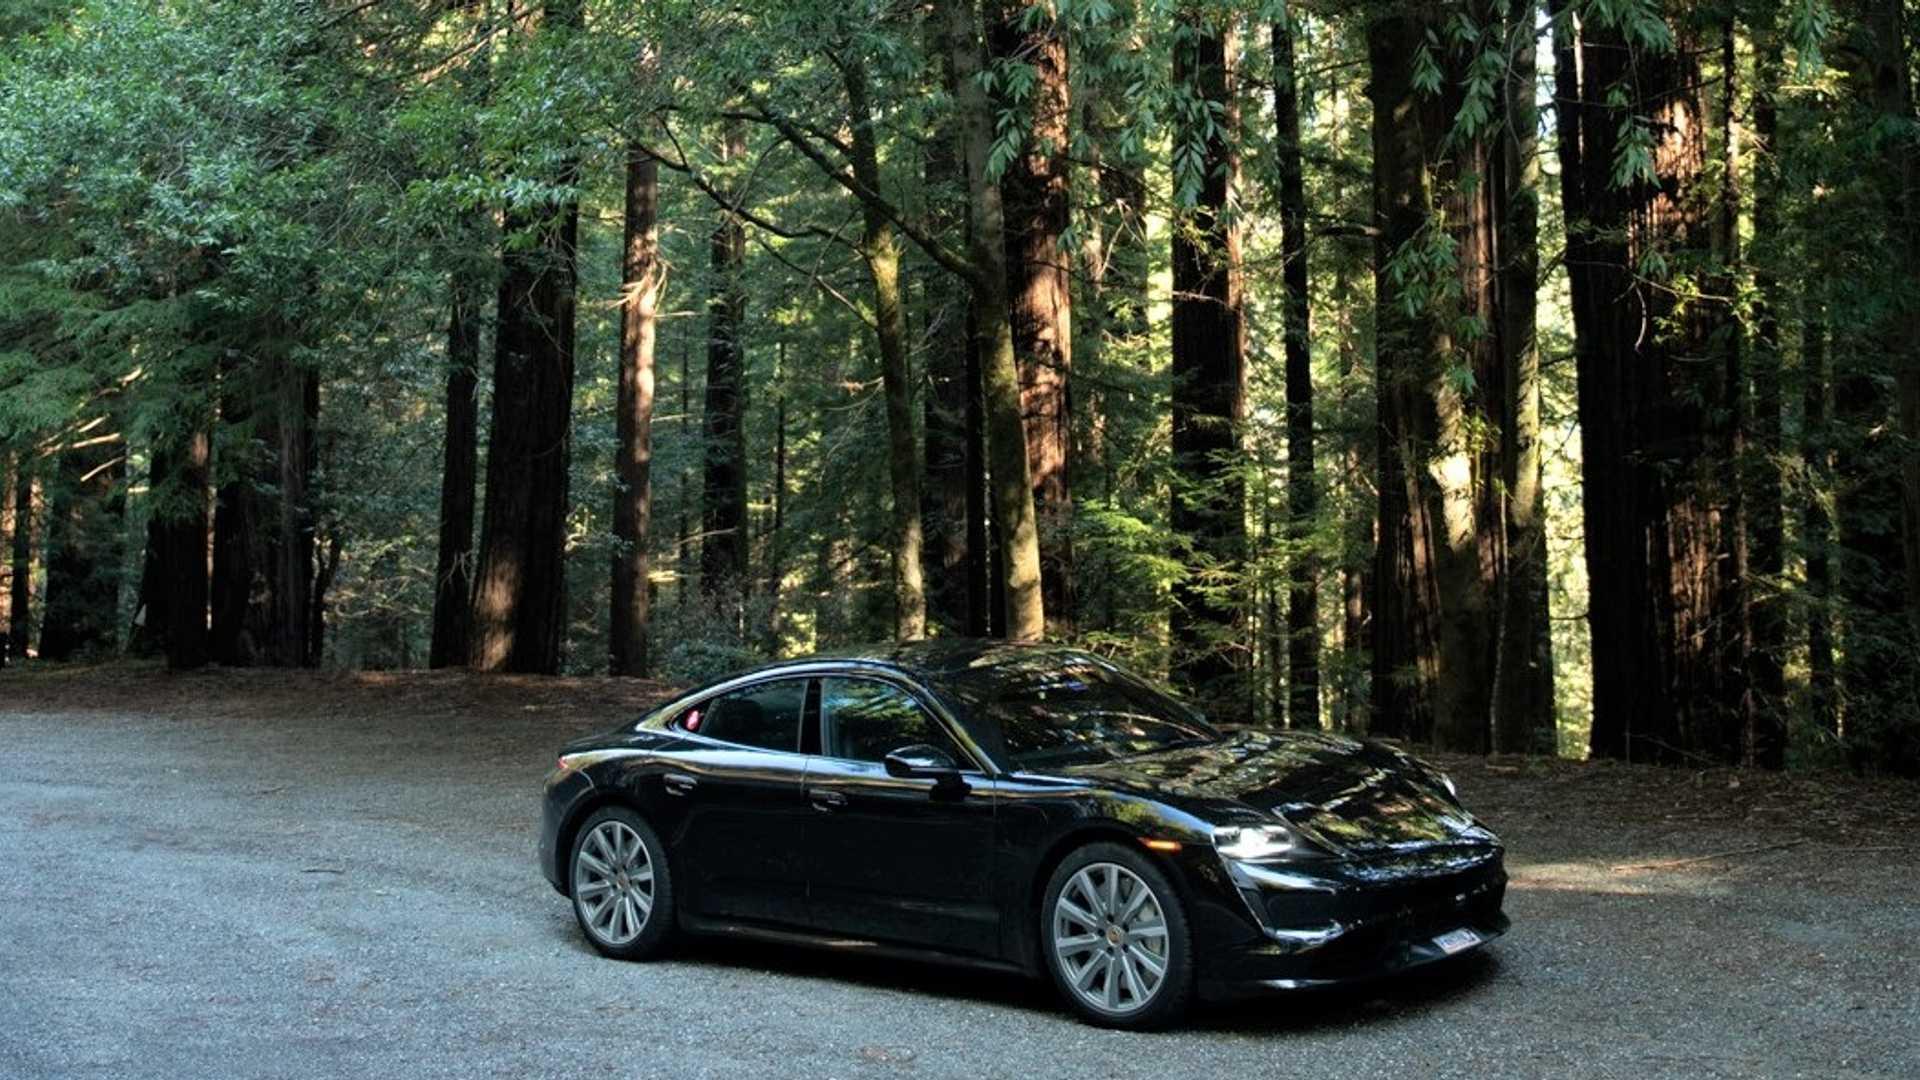 Road_trip_Porsche_Taycan_Turbo_0007